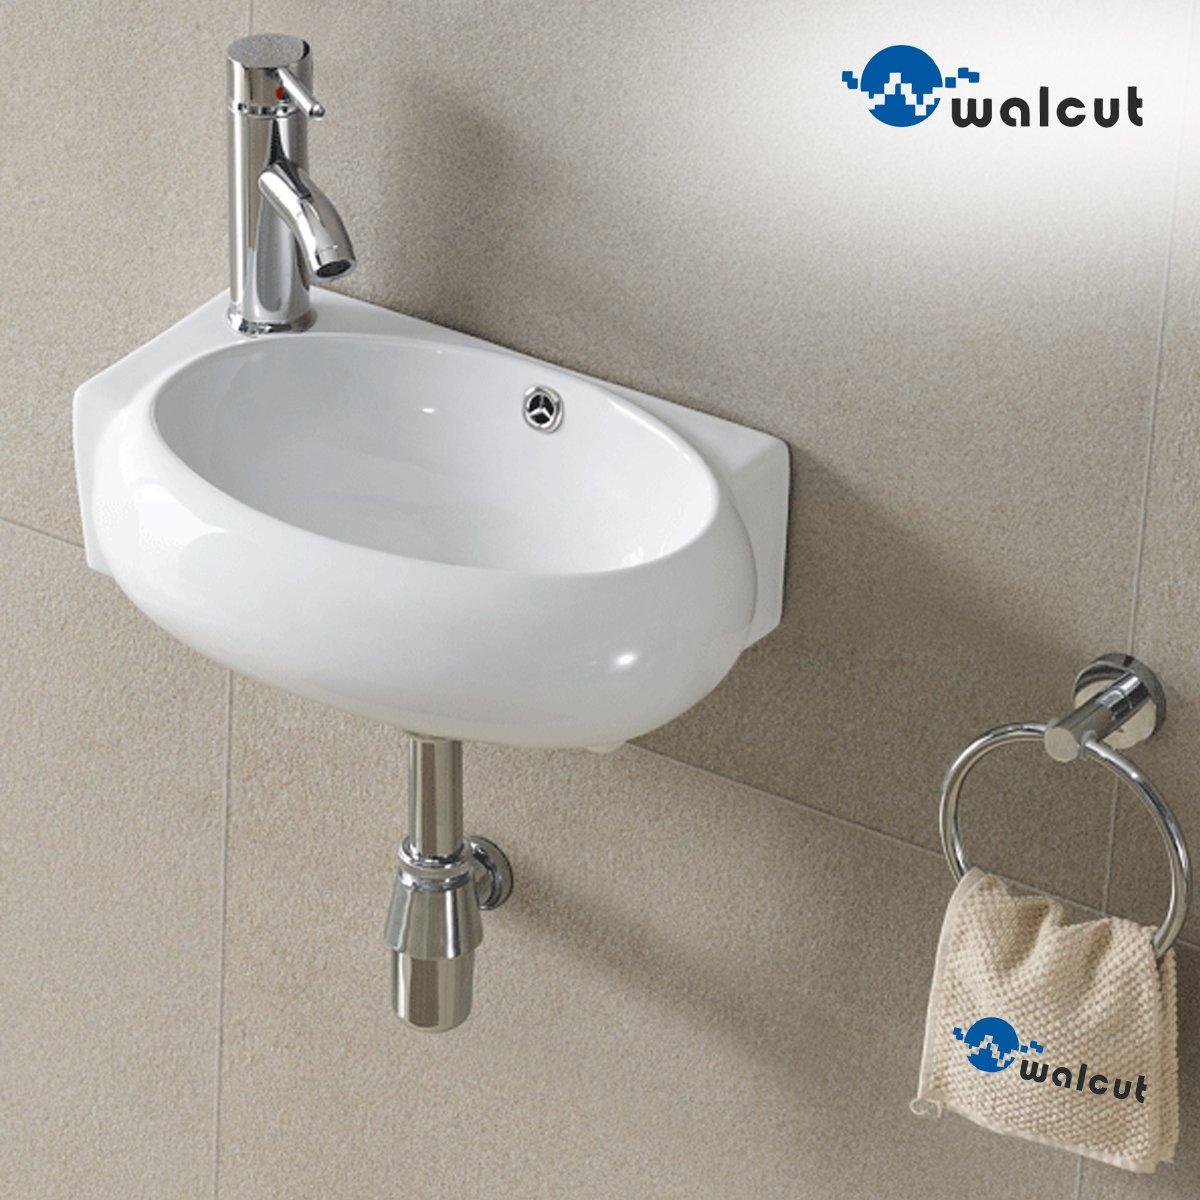 Chic Walcut Corner Wall Mount Bathroom White Porcelain Ceramic Vessel Sink Chrome Faucet Combo